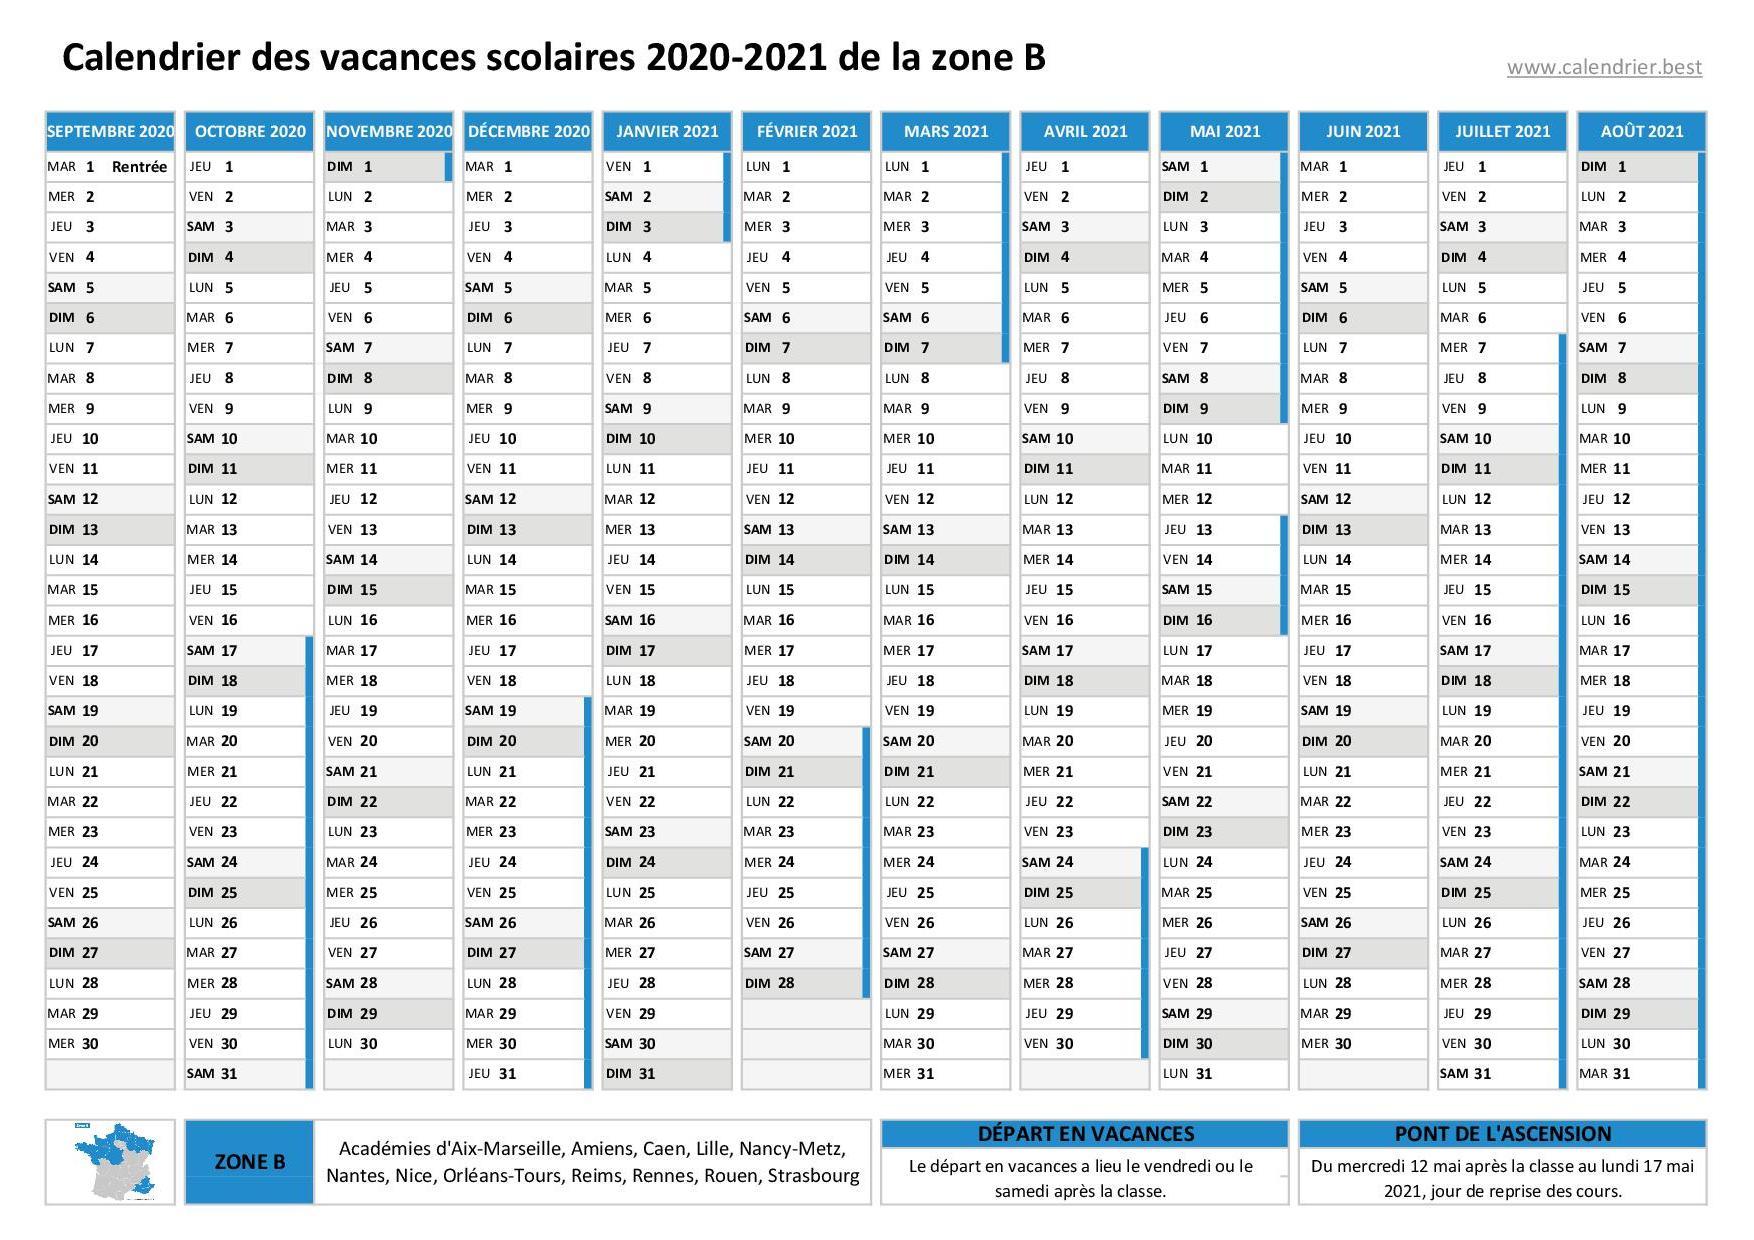 Vacances scolaires 2020 2021 et 2021 2022 Strasbourg : dates et